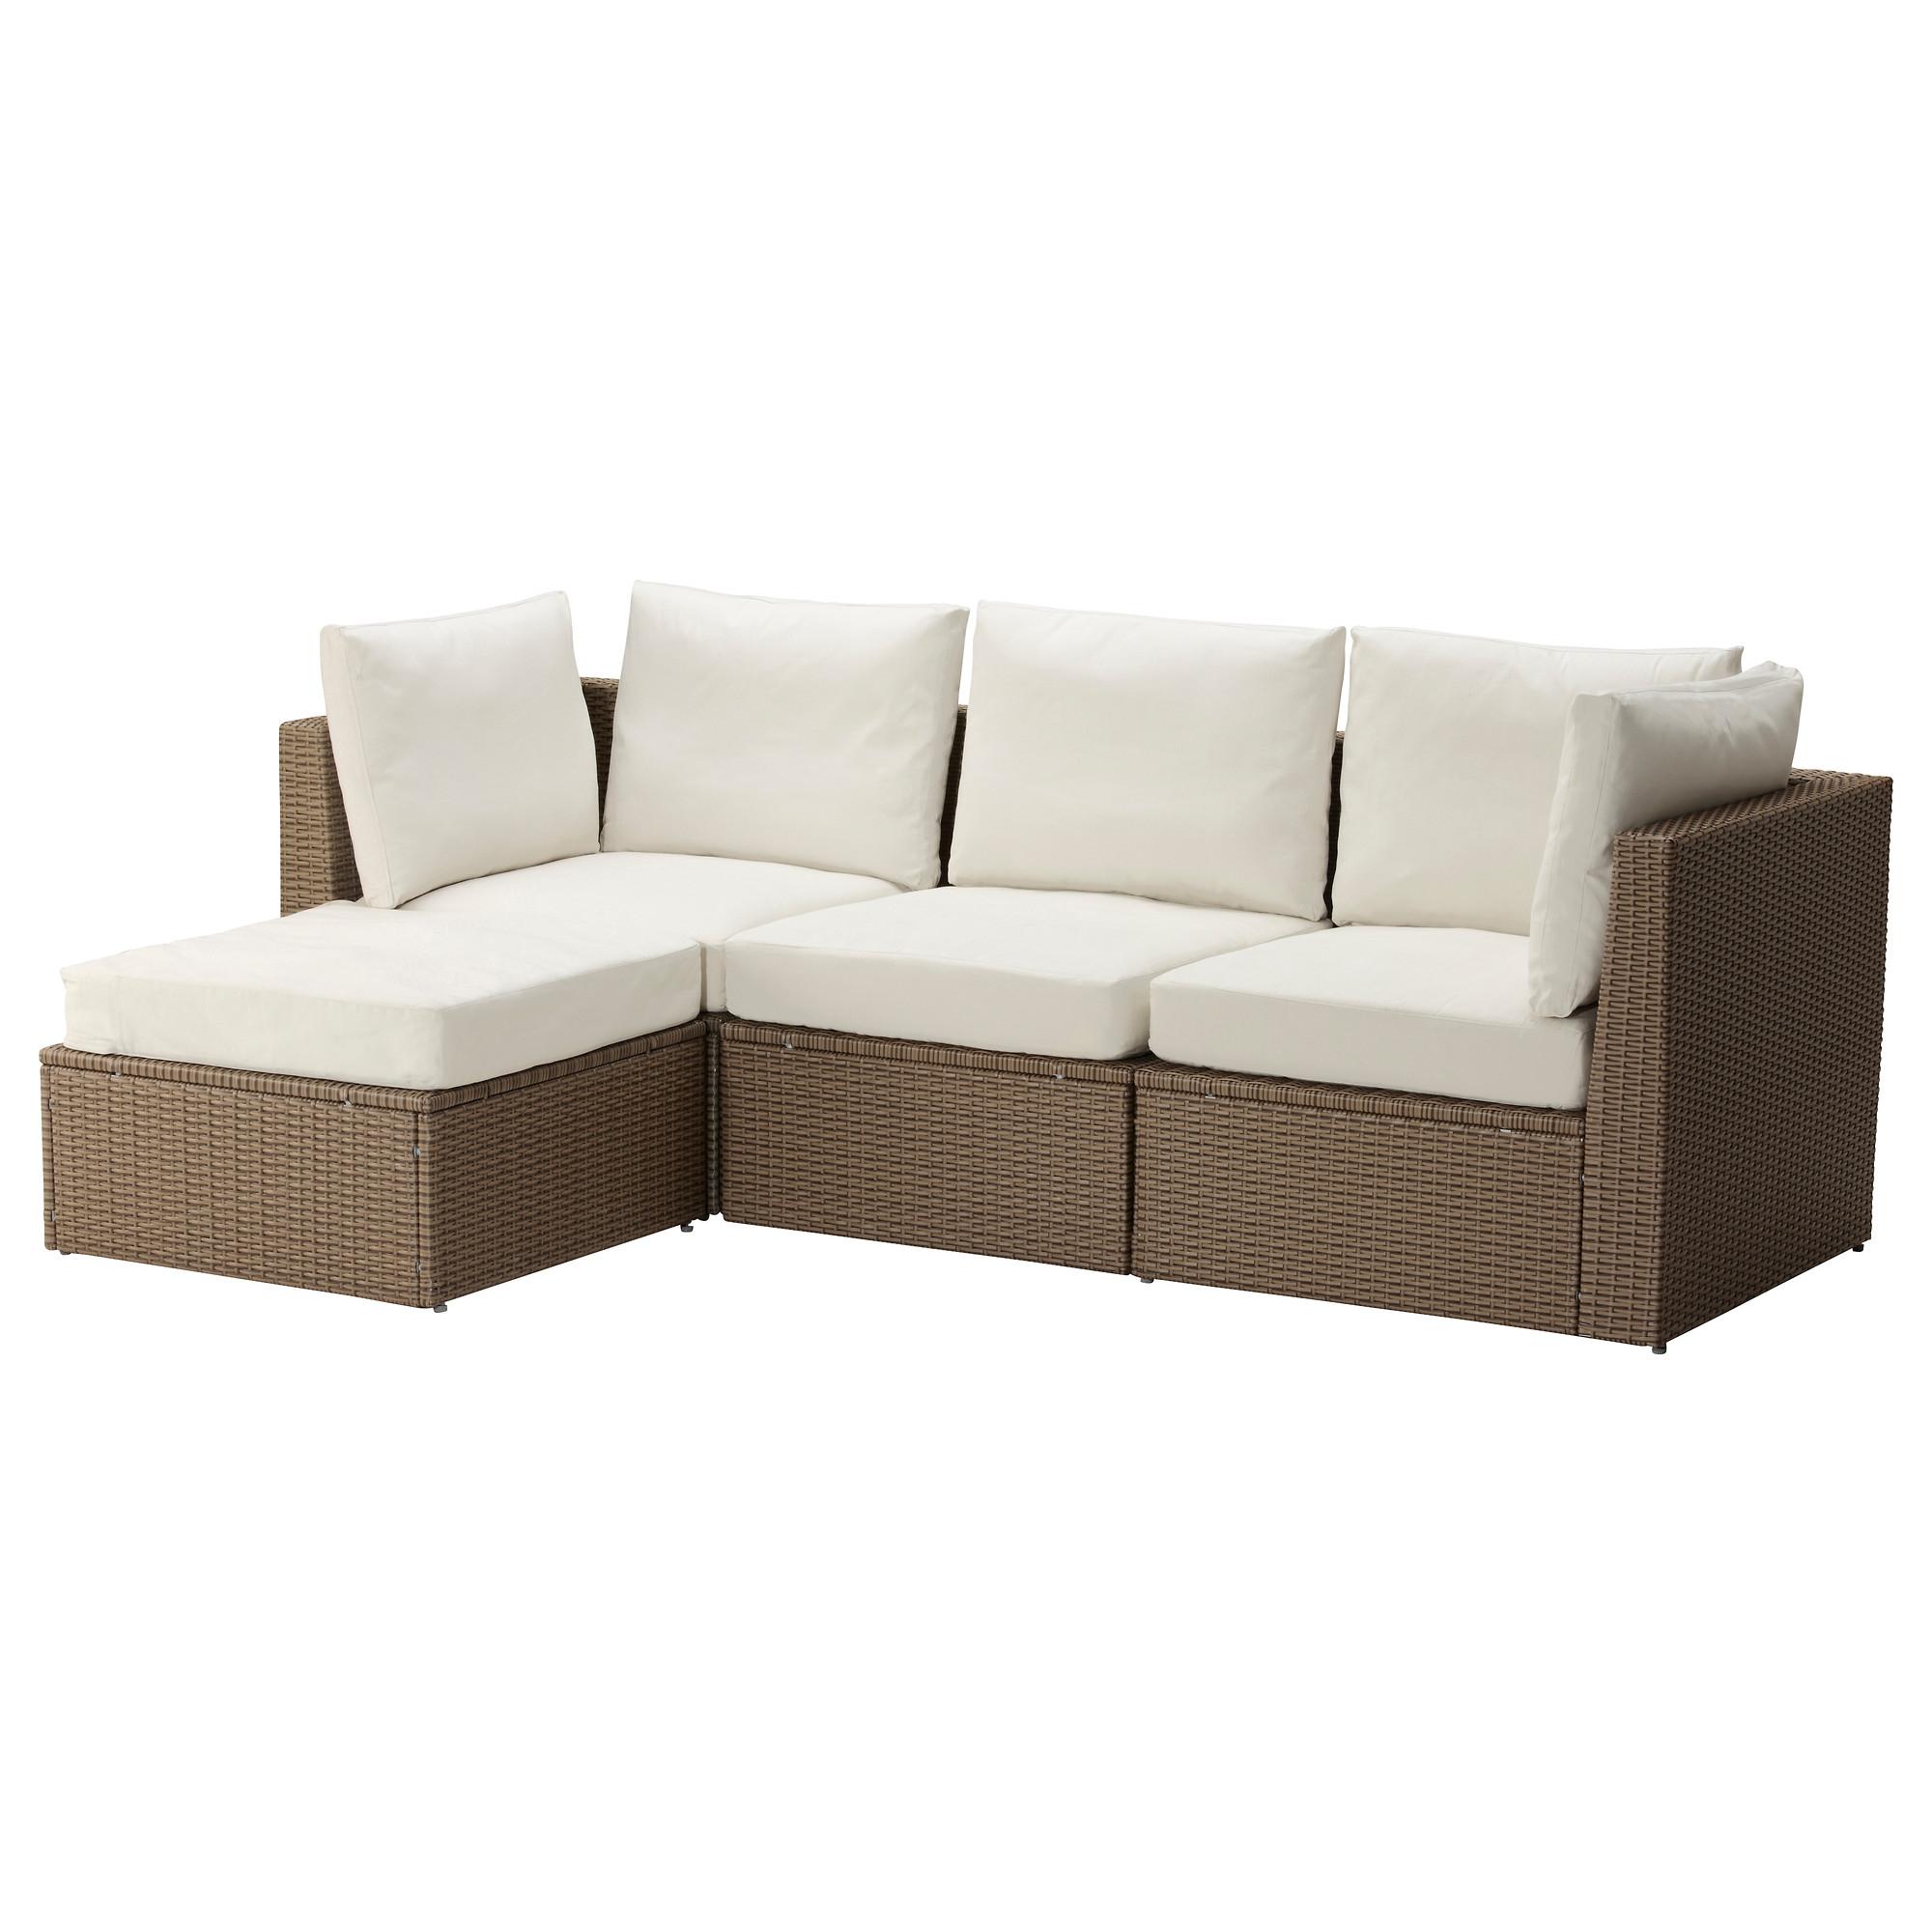 Arholma Ikea For Sofa Chairs Ikea (View 4 of 15)